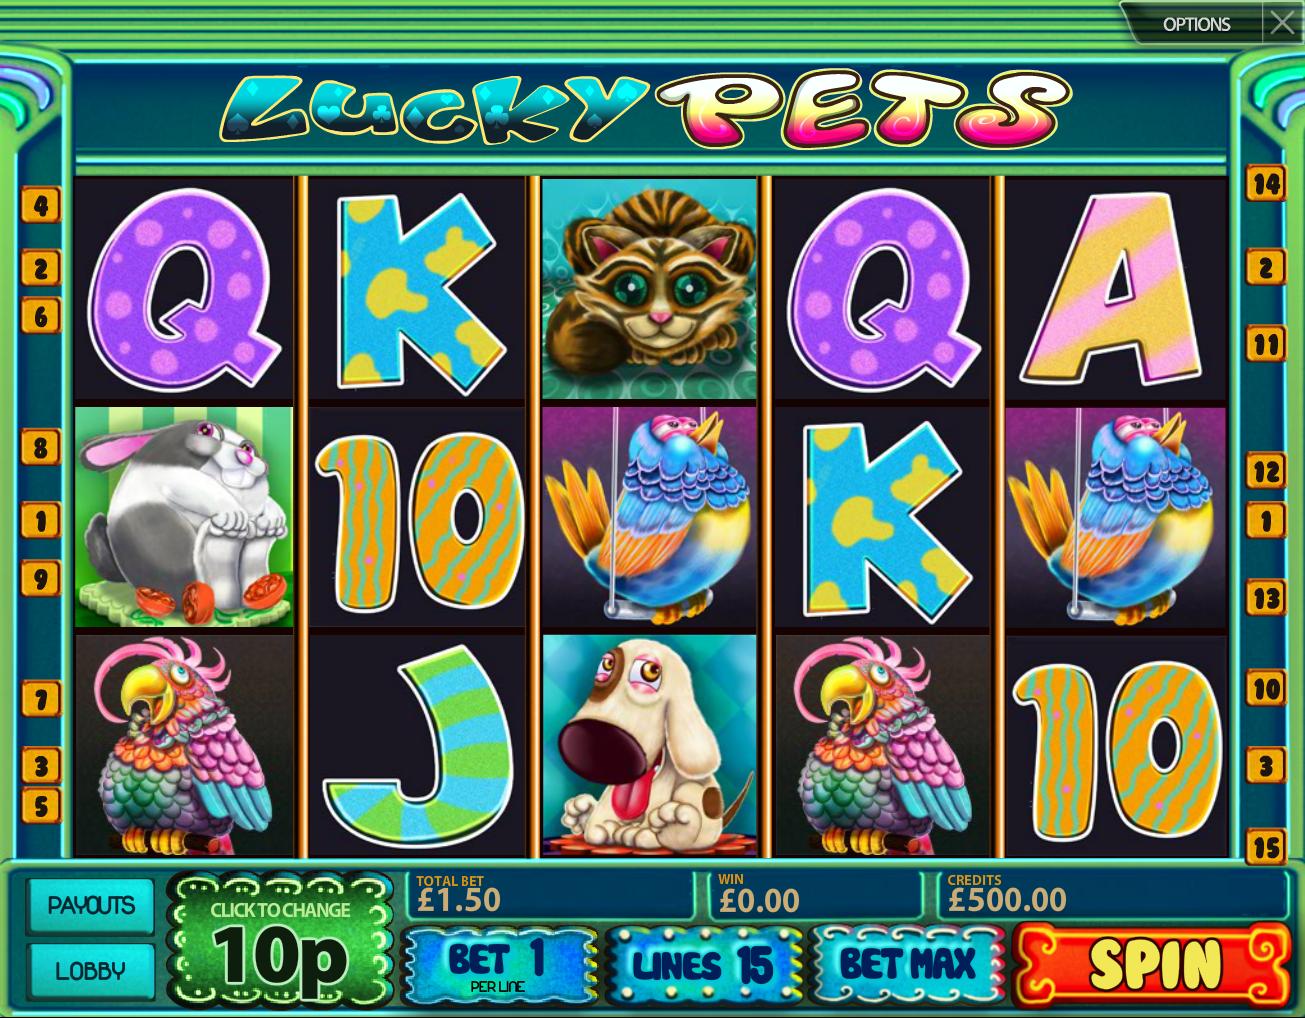 Classy slots betting online Zahlsklaven